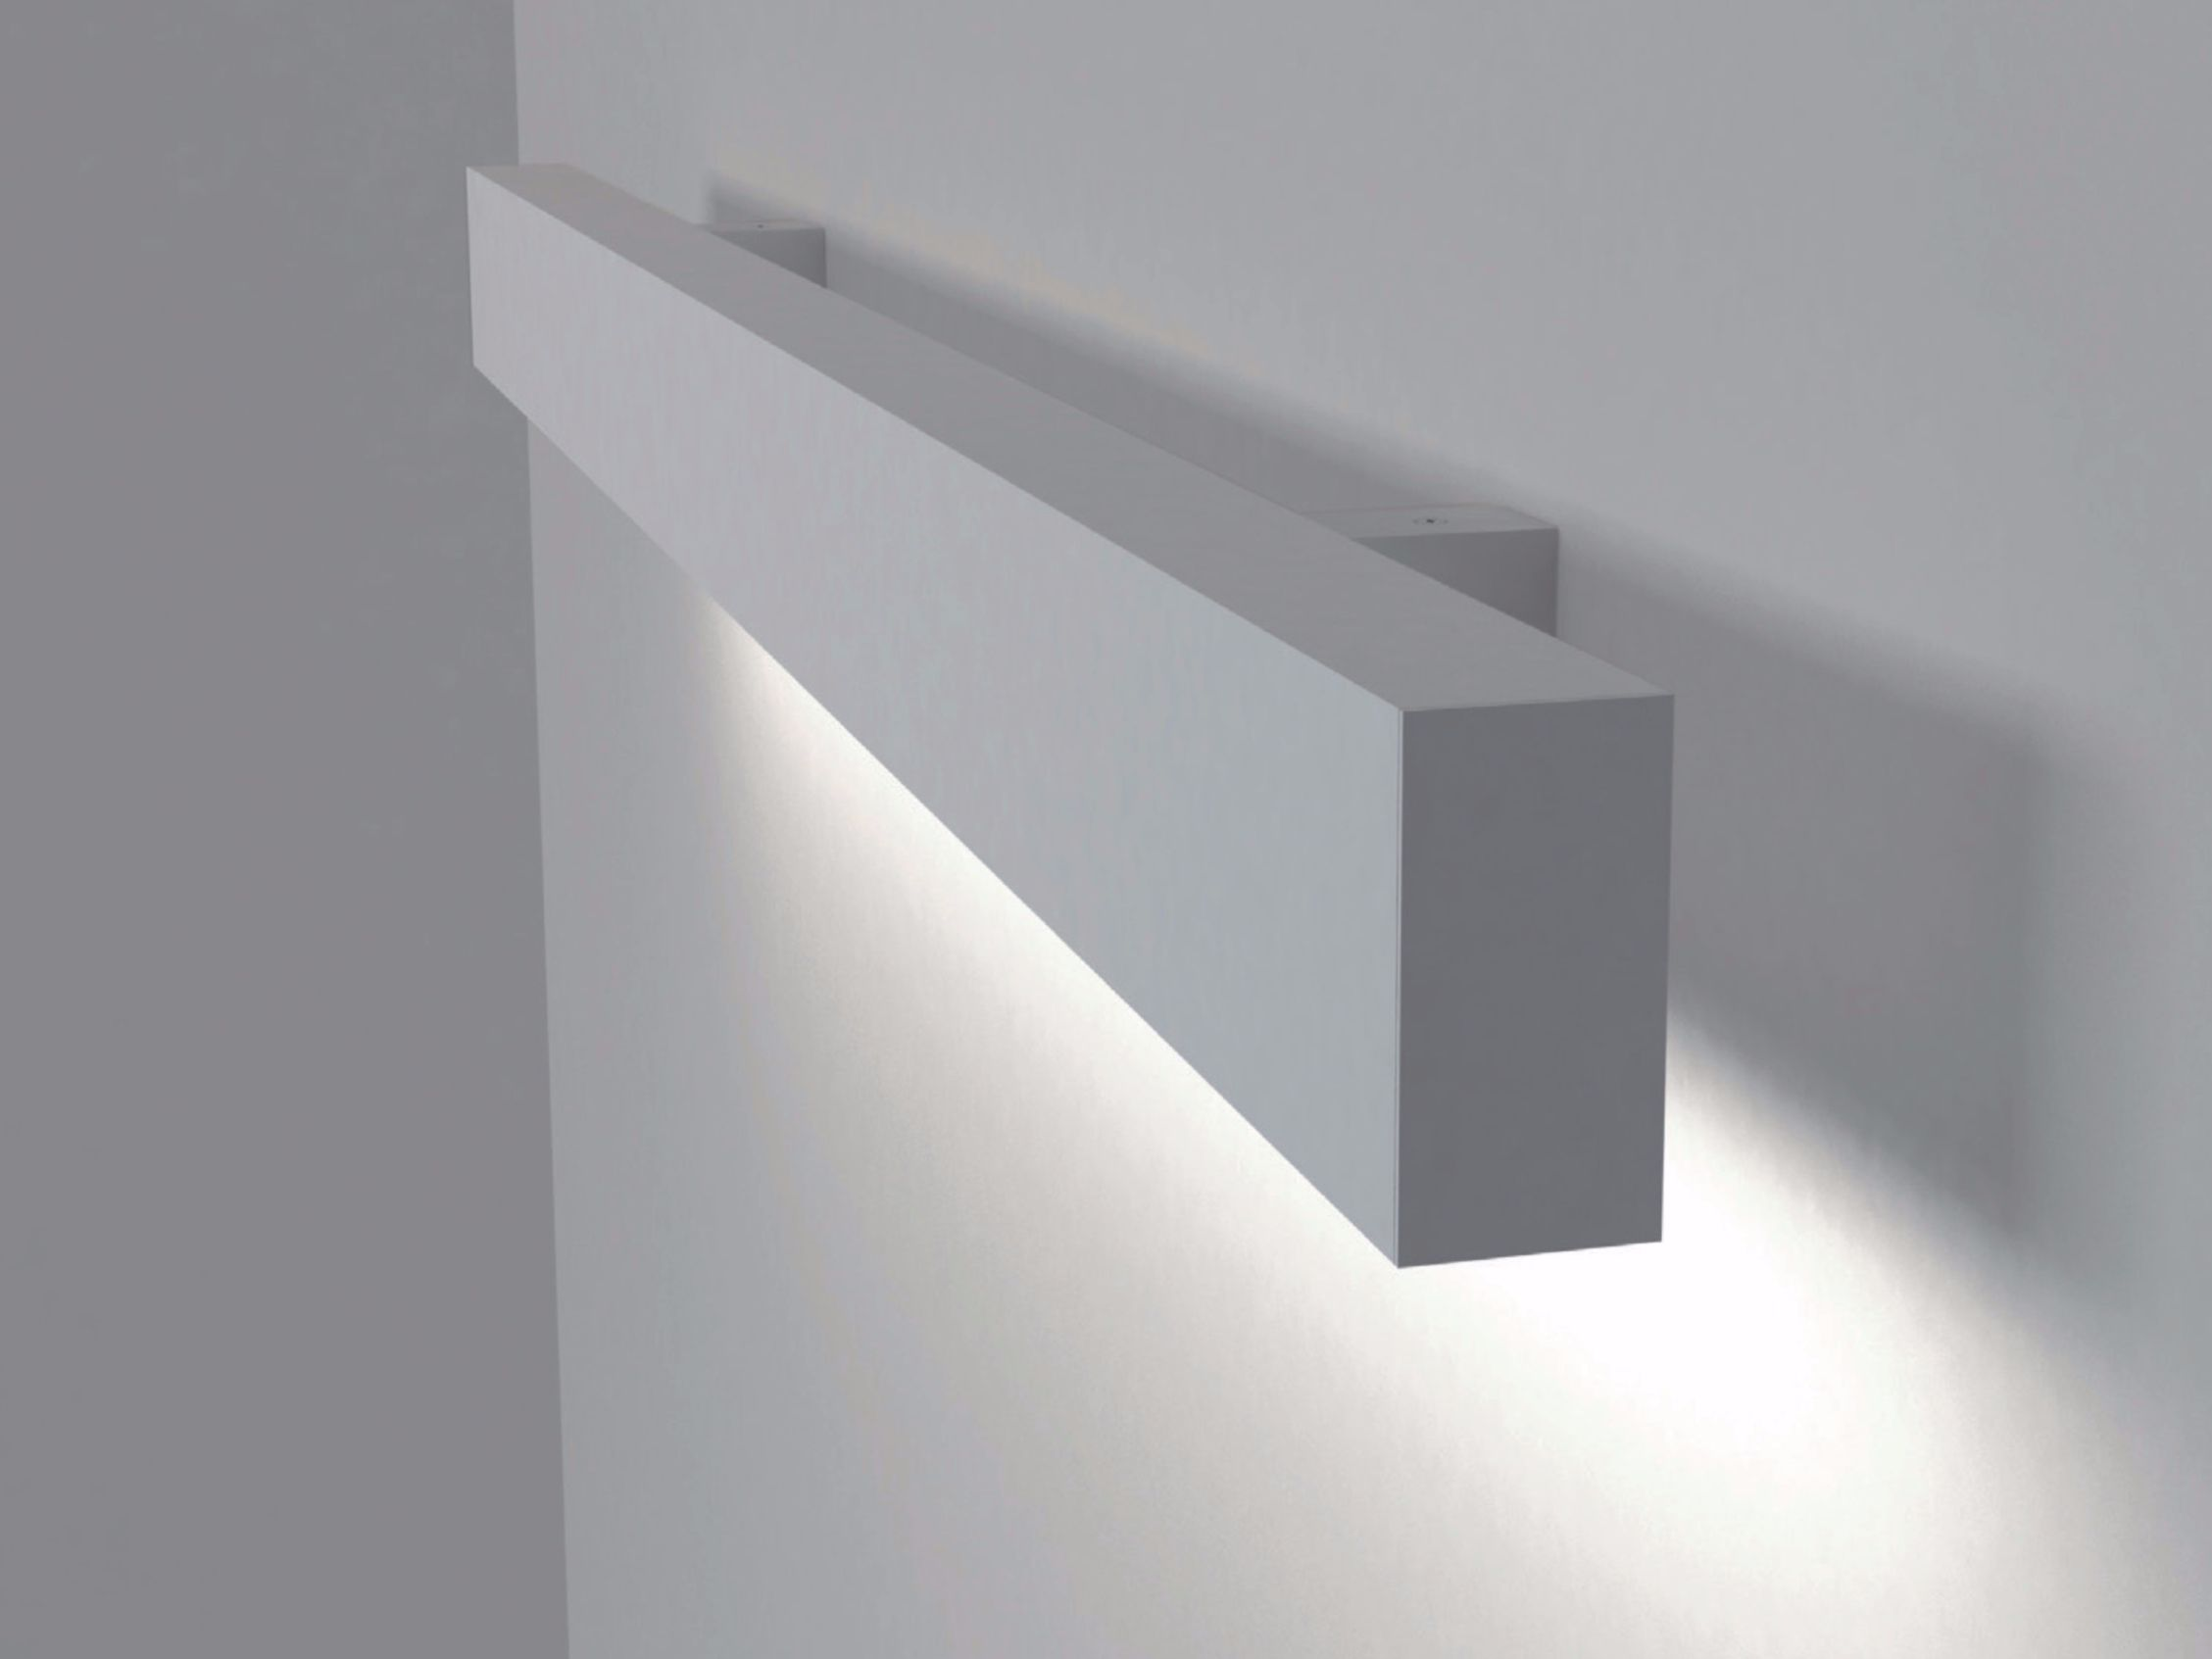 Led direct light aluminium wall lamp infinity wall nexia - Iluminacion led cocina ...